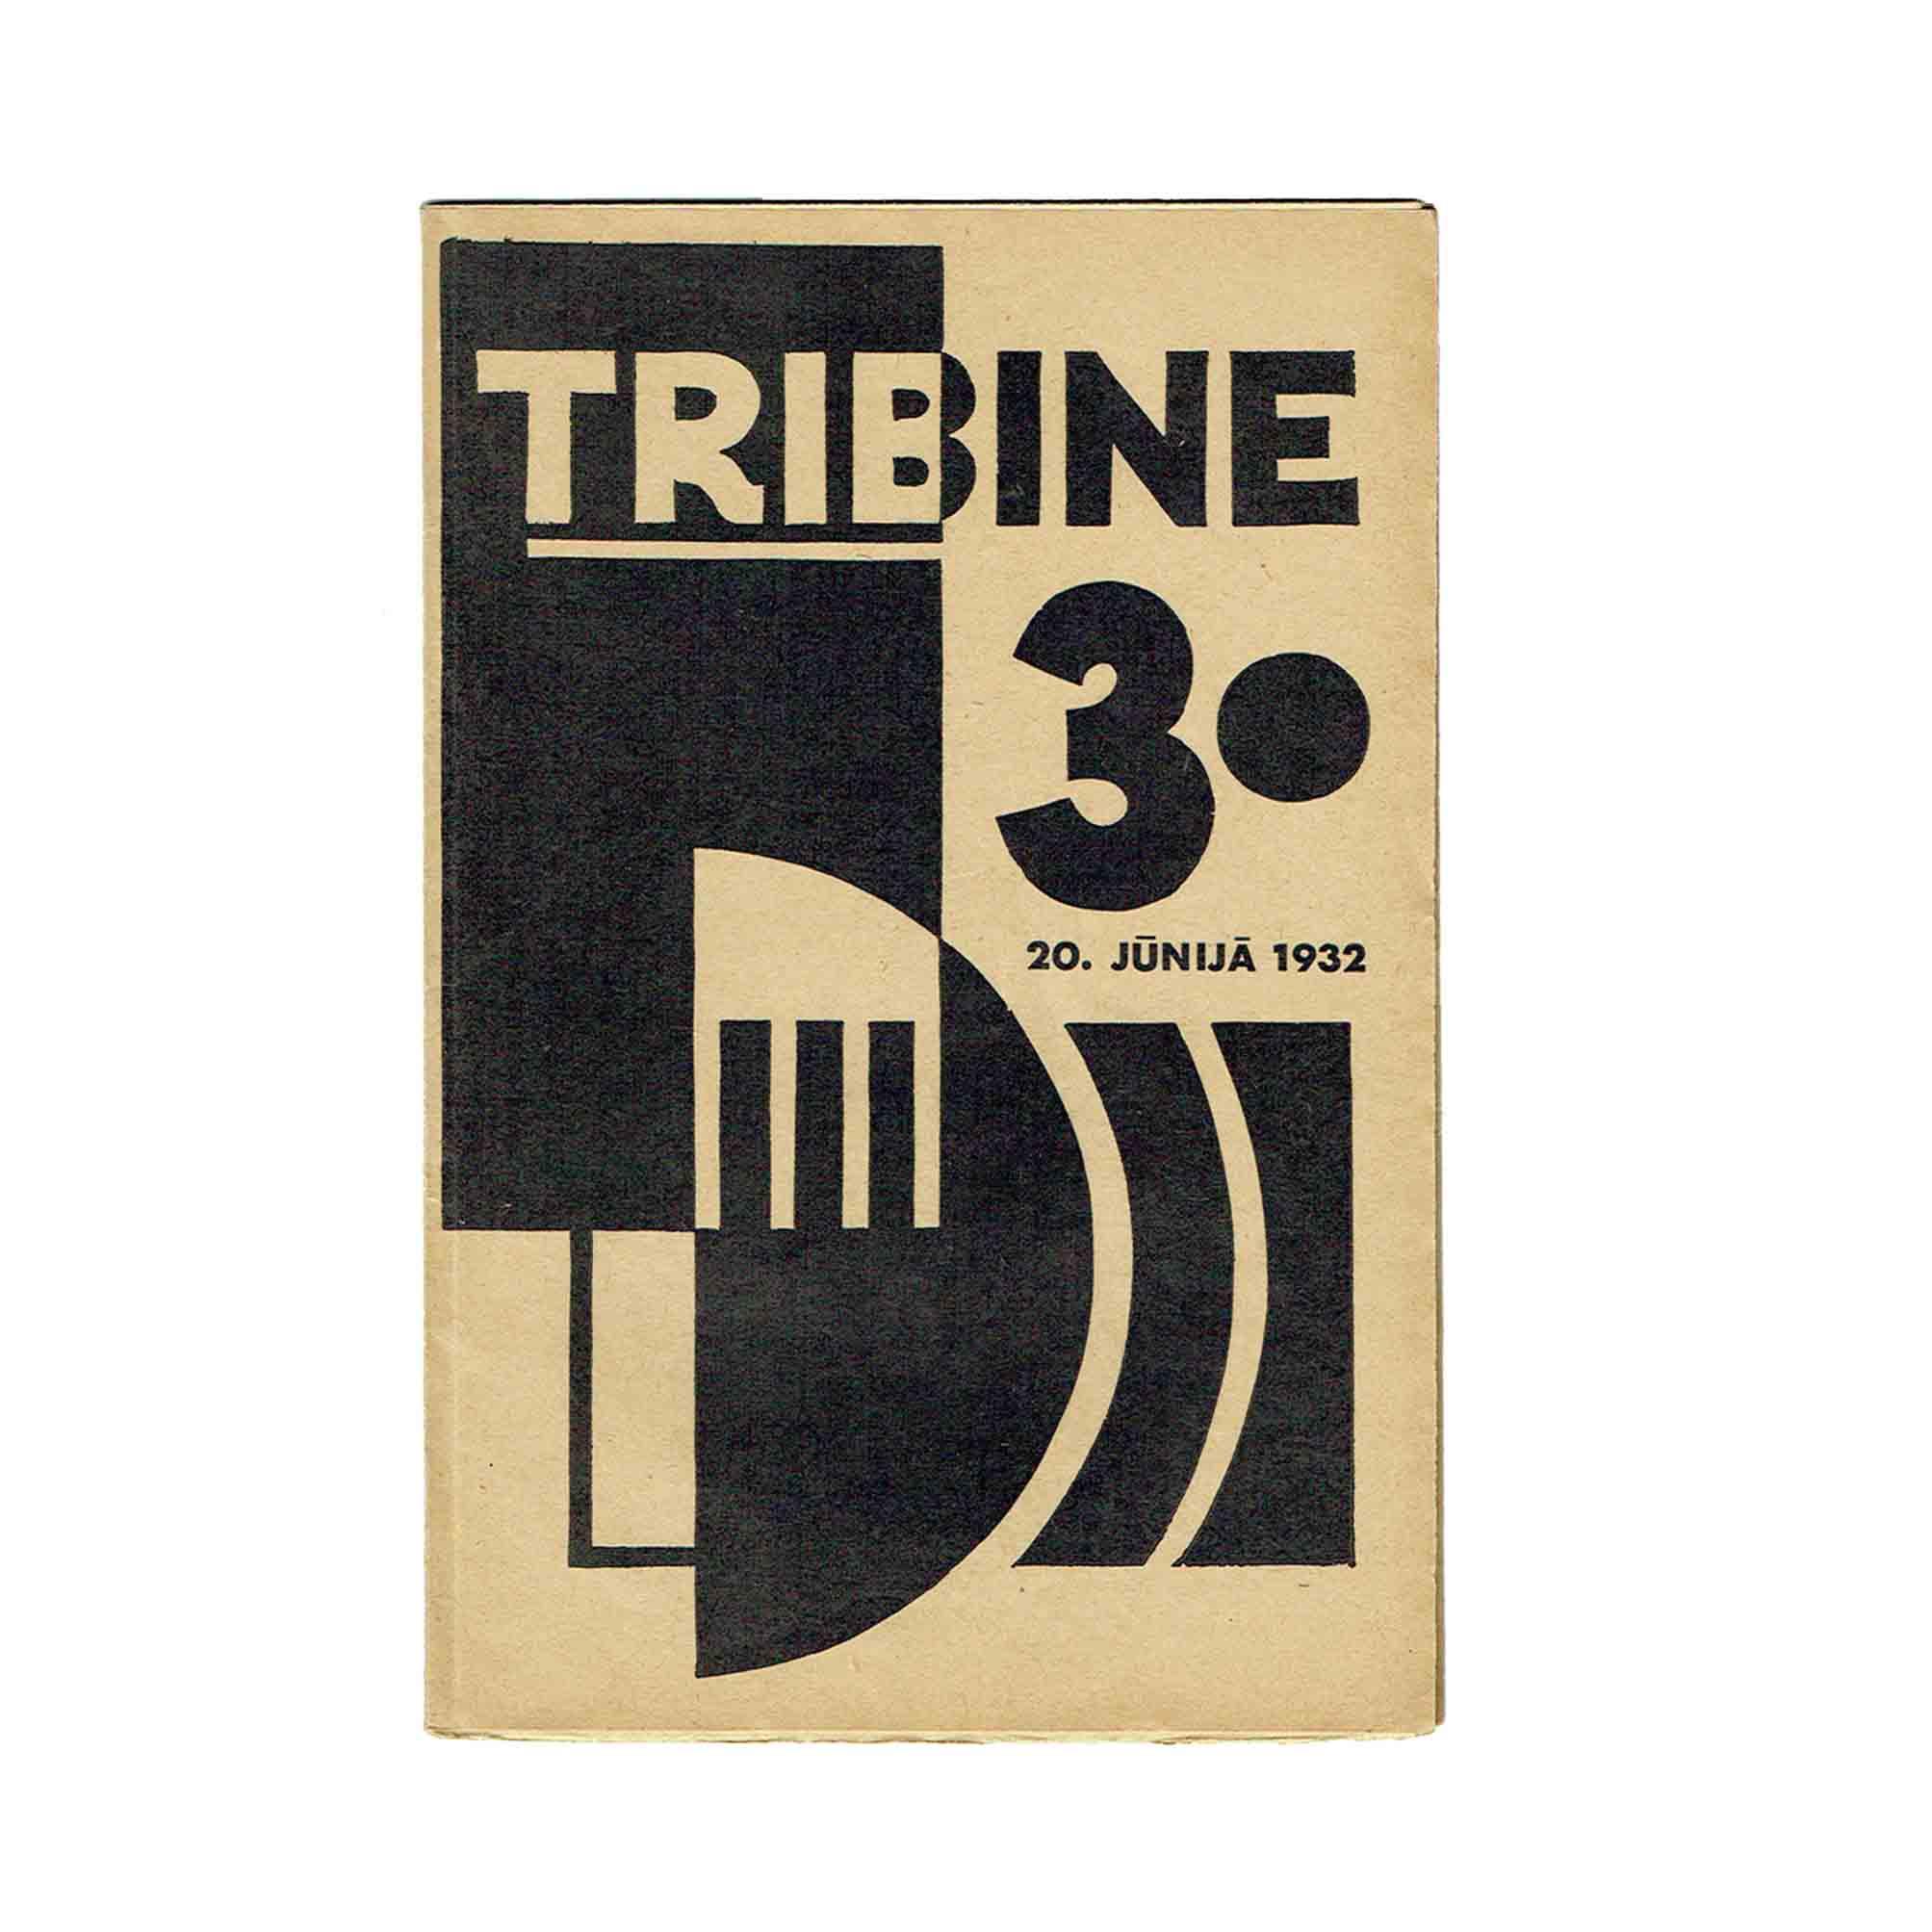 5837K-Tribine-II-3-1932-frei-N.jpeg